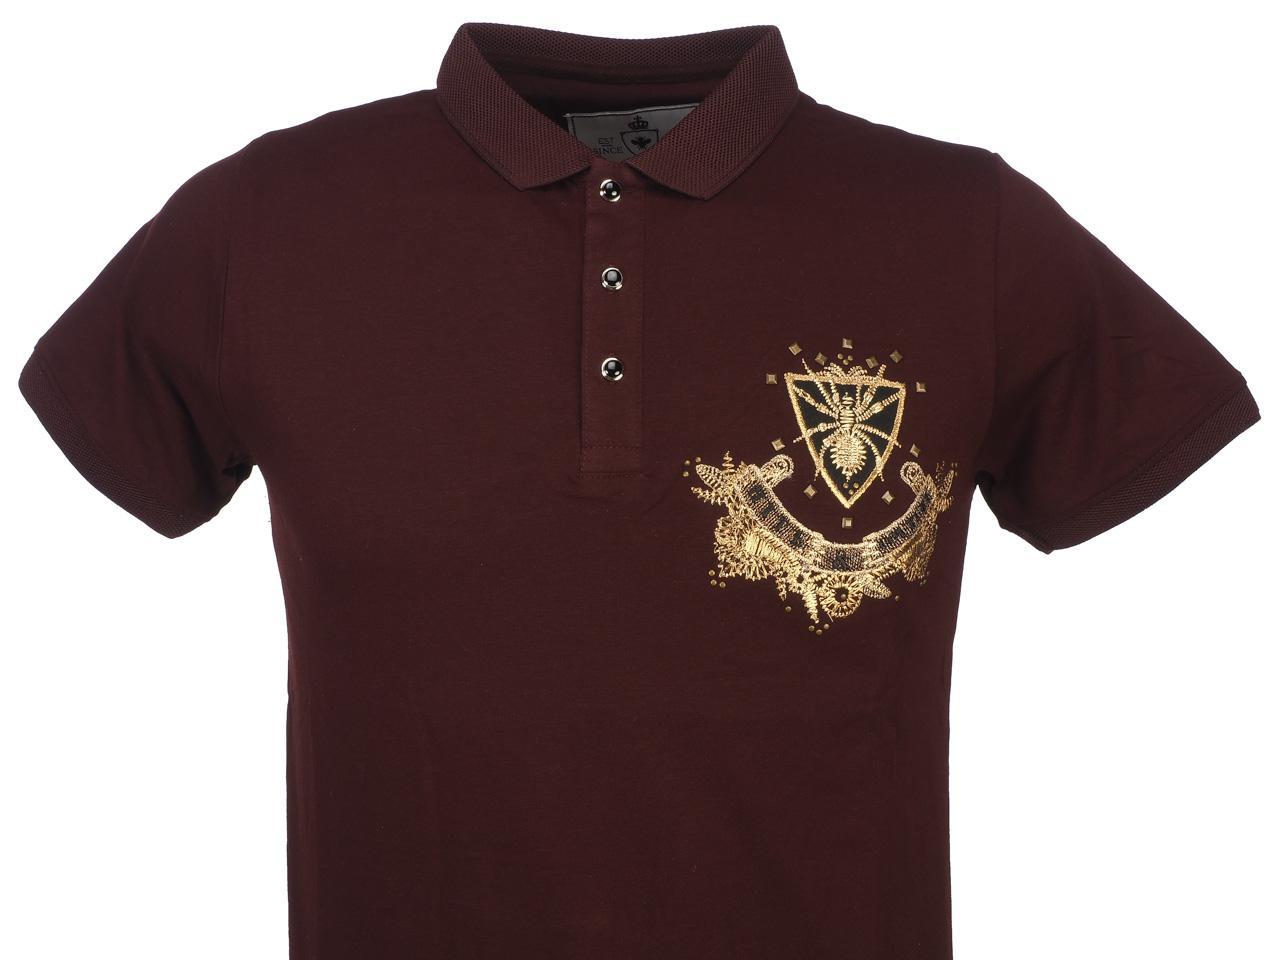 Short-Sleeve-Polo-Hite-Couture-Pamiler-Bordeaux-Mc-Polo-Red-11573-New thumbnail 2